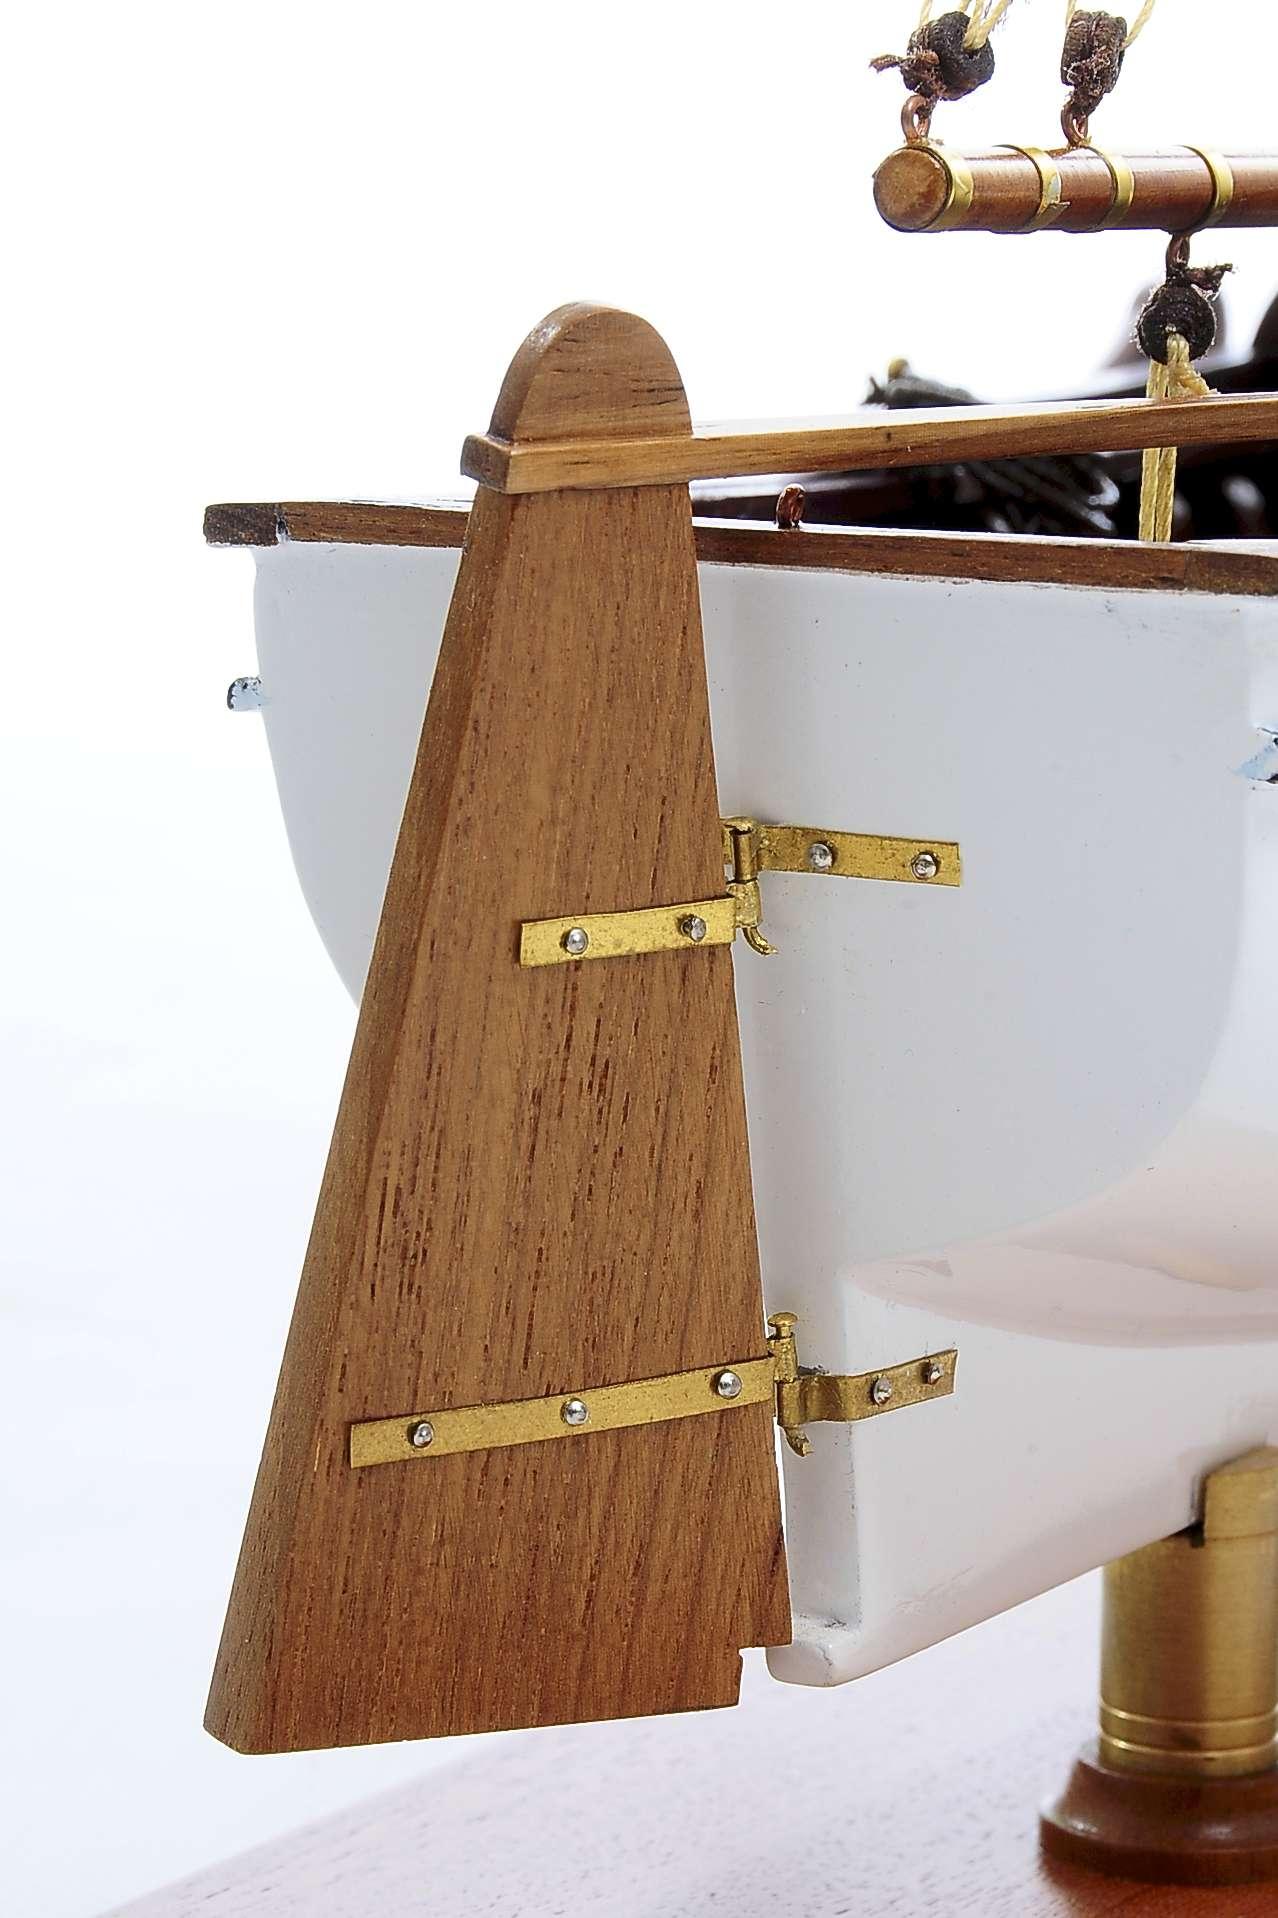 1432-4579-Dutch-Marker-Roundbow-Model-Boat